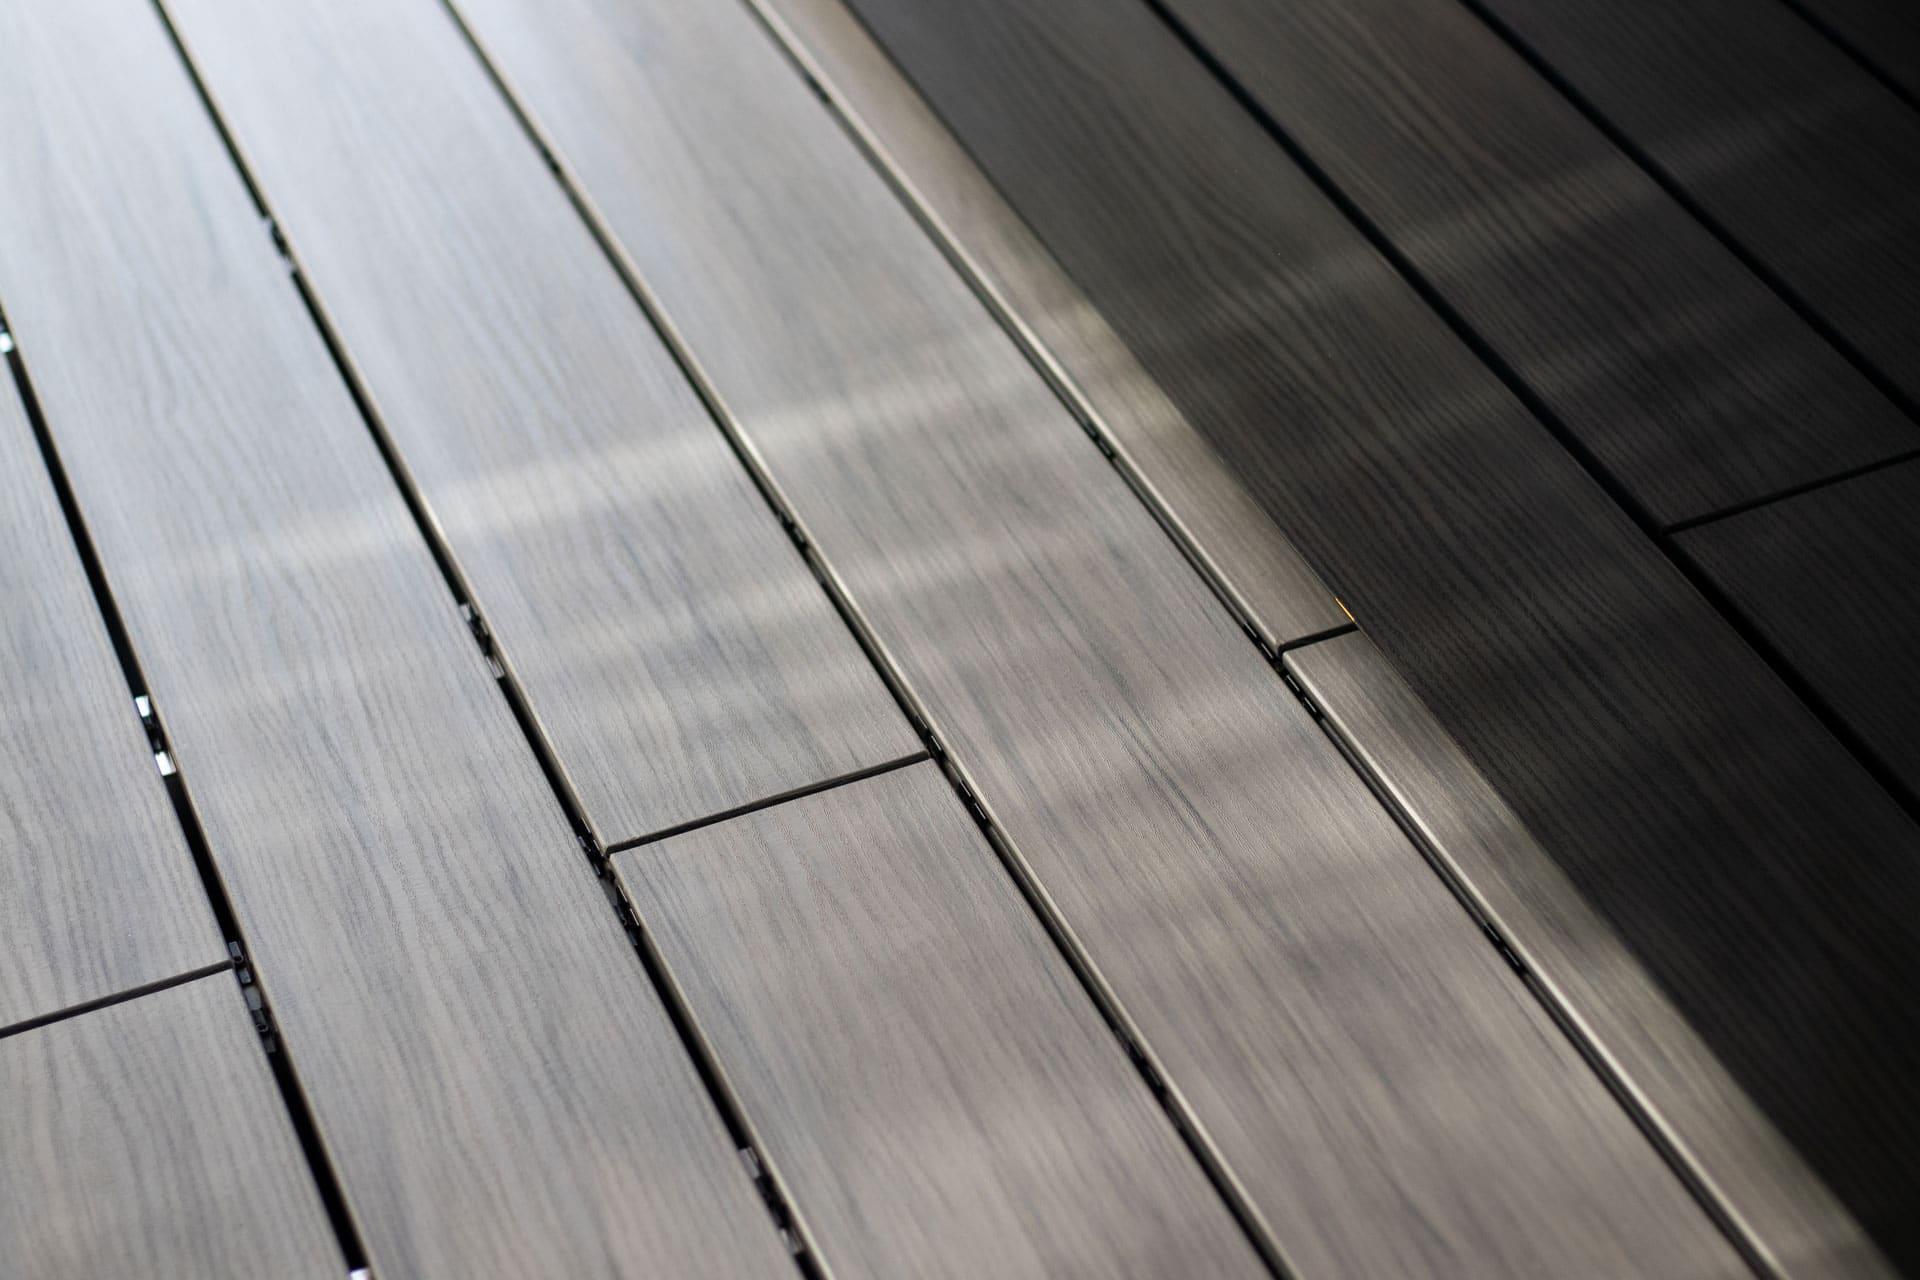 B Fano Ultrashield 02 g | grau-braune WPC-Terrassendielen Nahaufnahme der Holzoptik | Svoboda